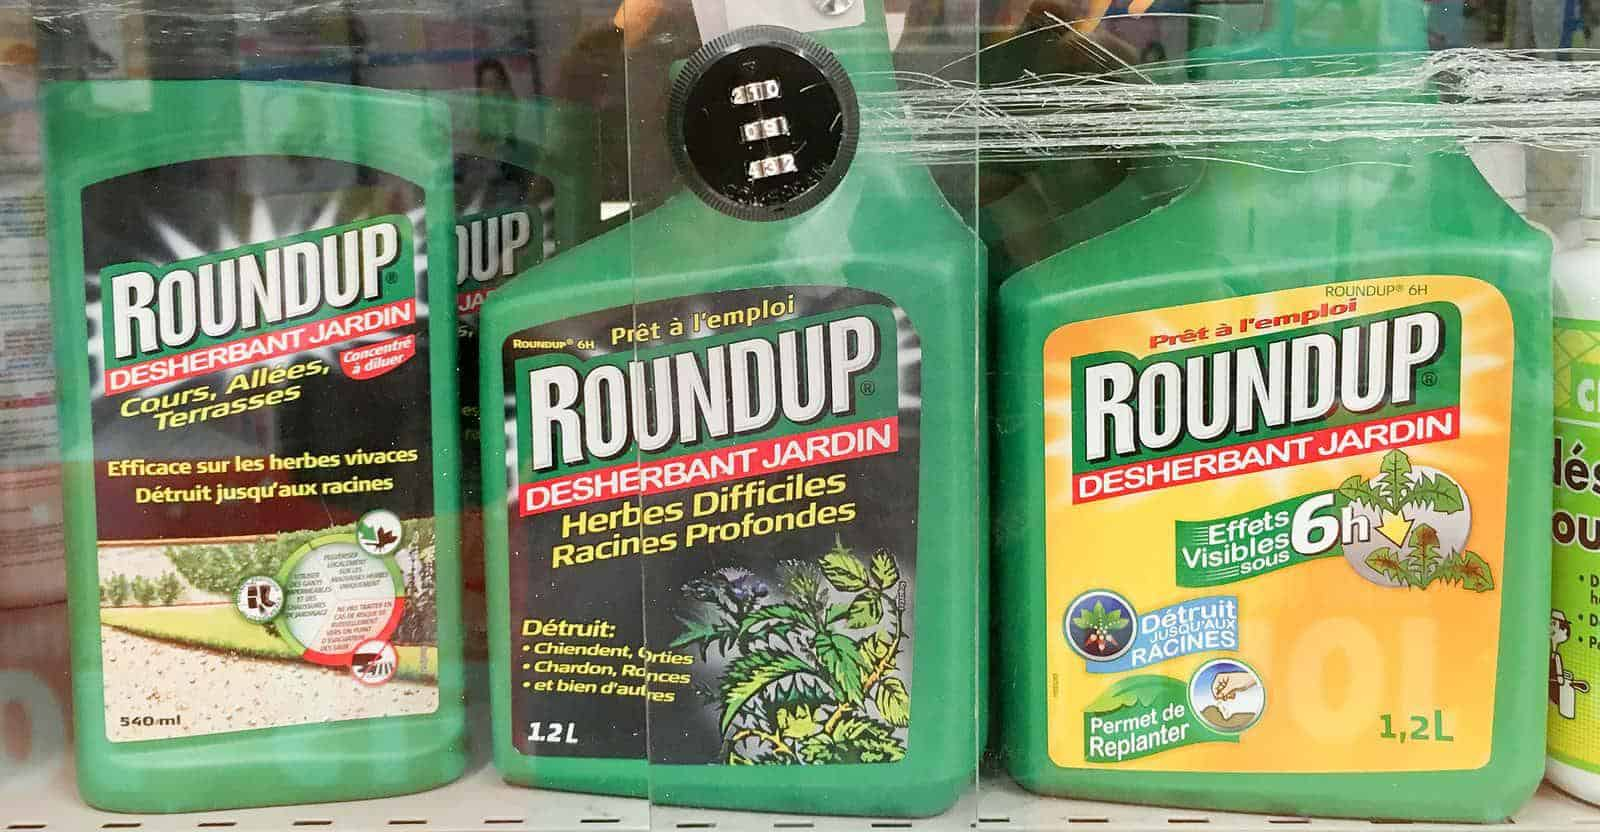 Roundup Weed Killer, Not Hepatitis, Caused Plaintiff's Cancer